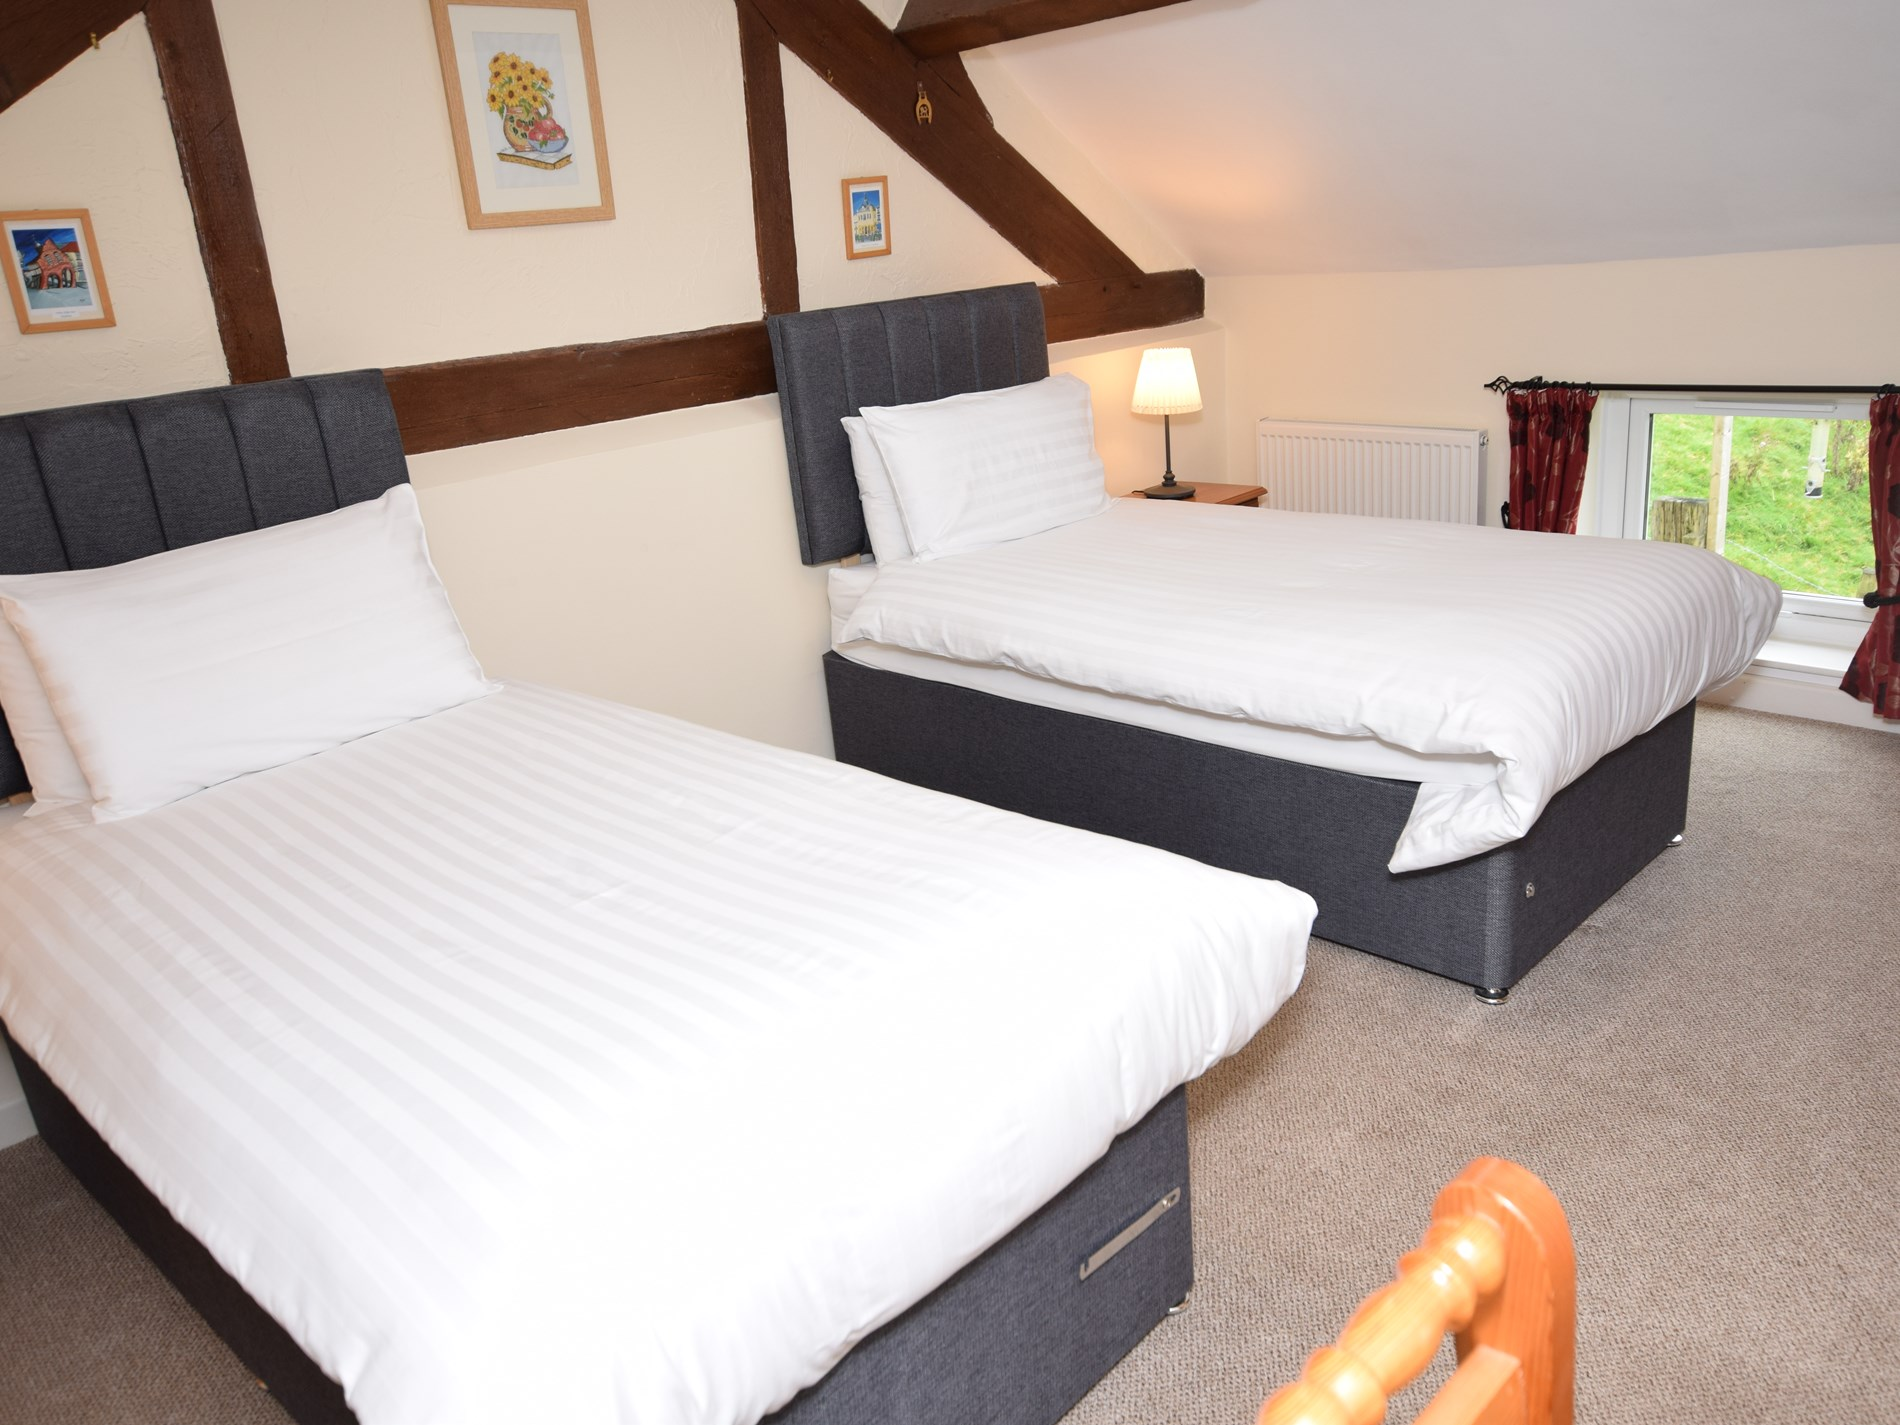 2 Bedroom Cottage in Llanidloes, Mid Wales